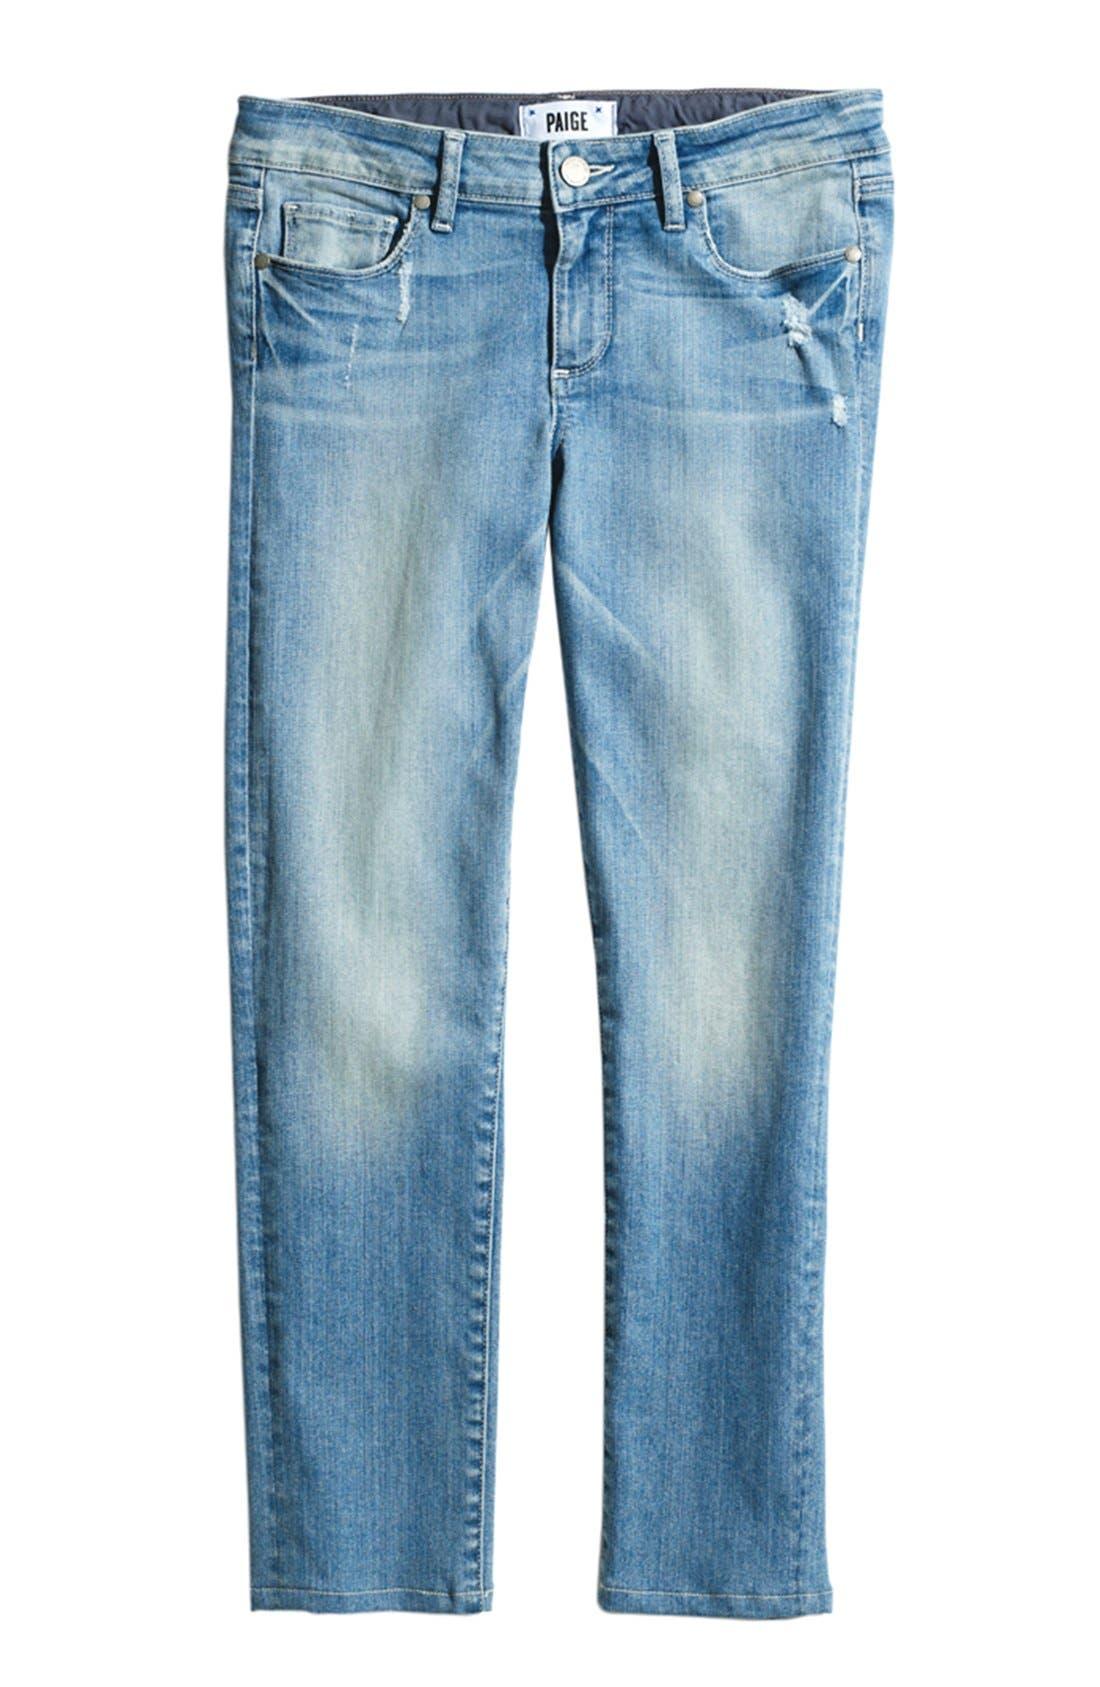 Alternate Image 4  - Paige Denim 'Kylie' Crop Skinny Jeans (Whitley)